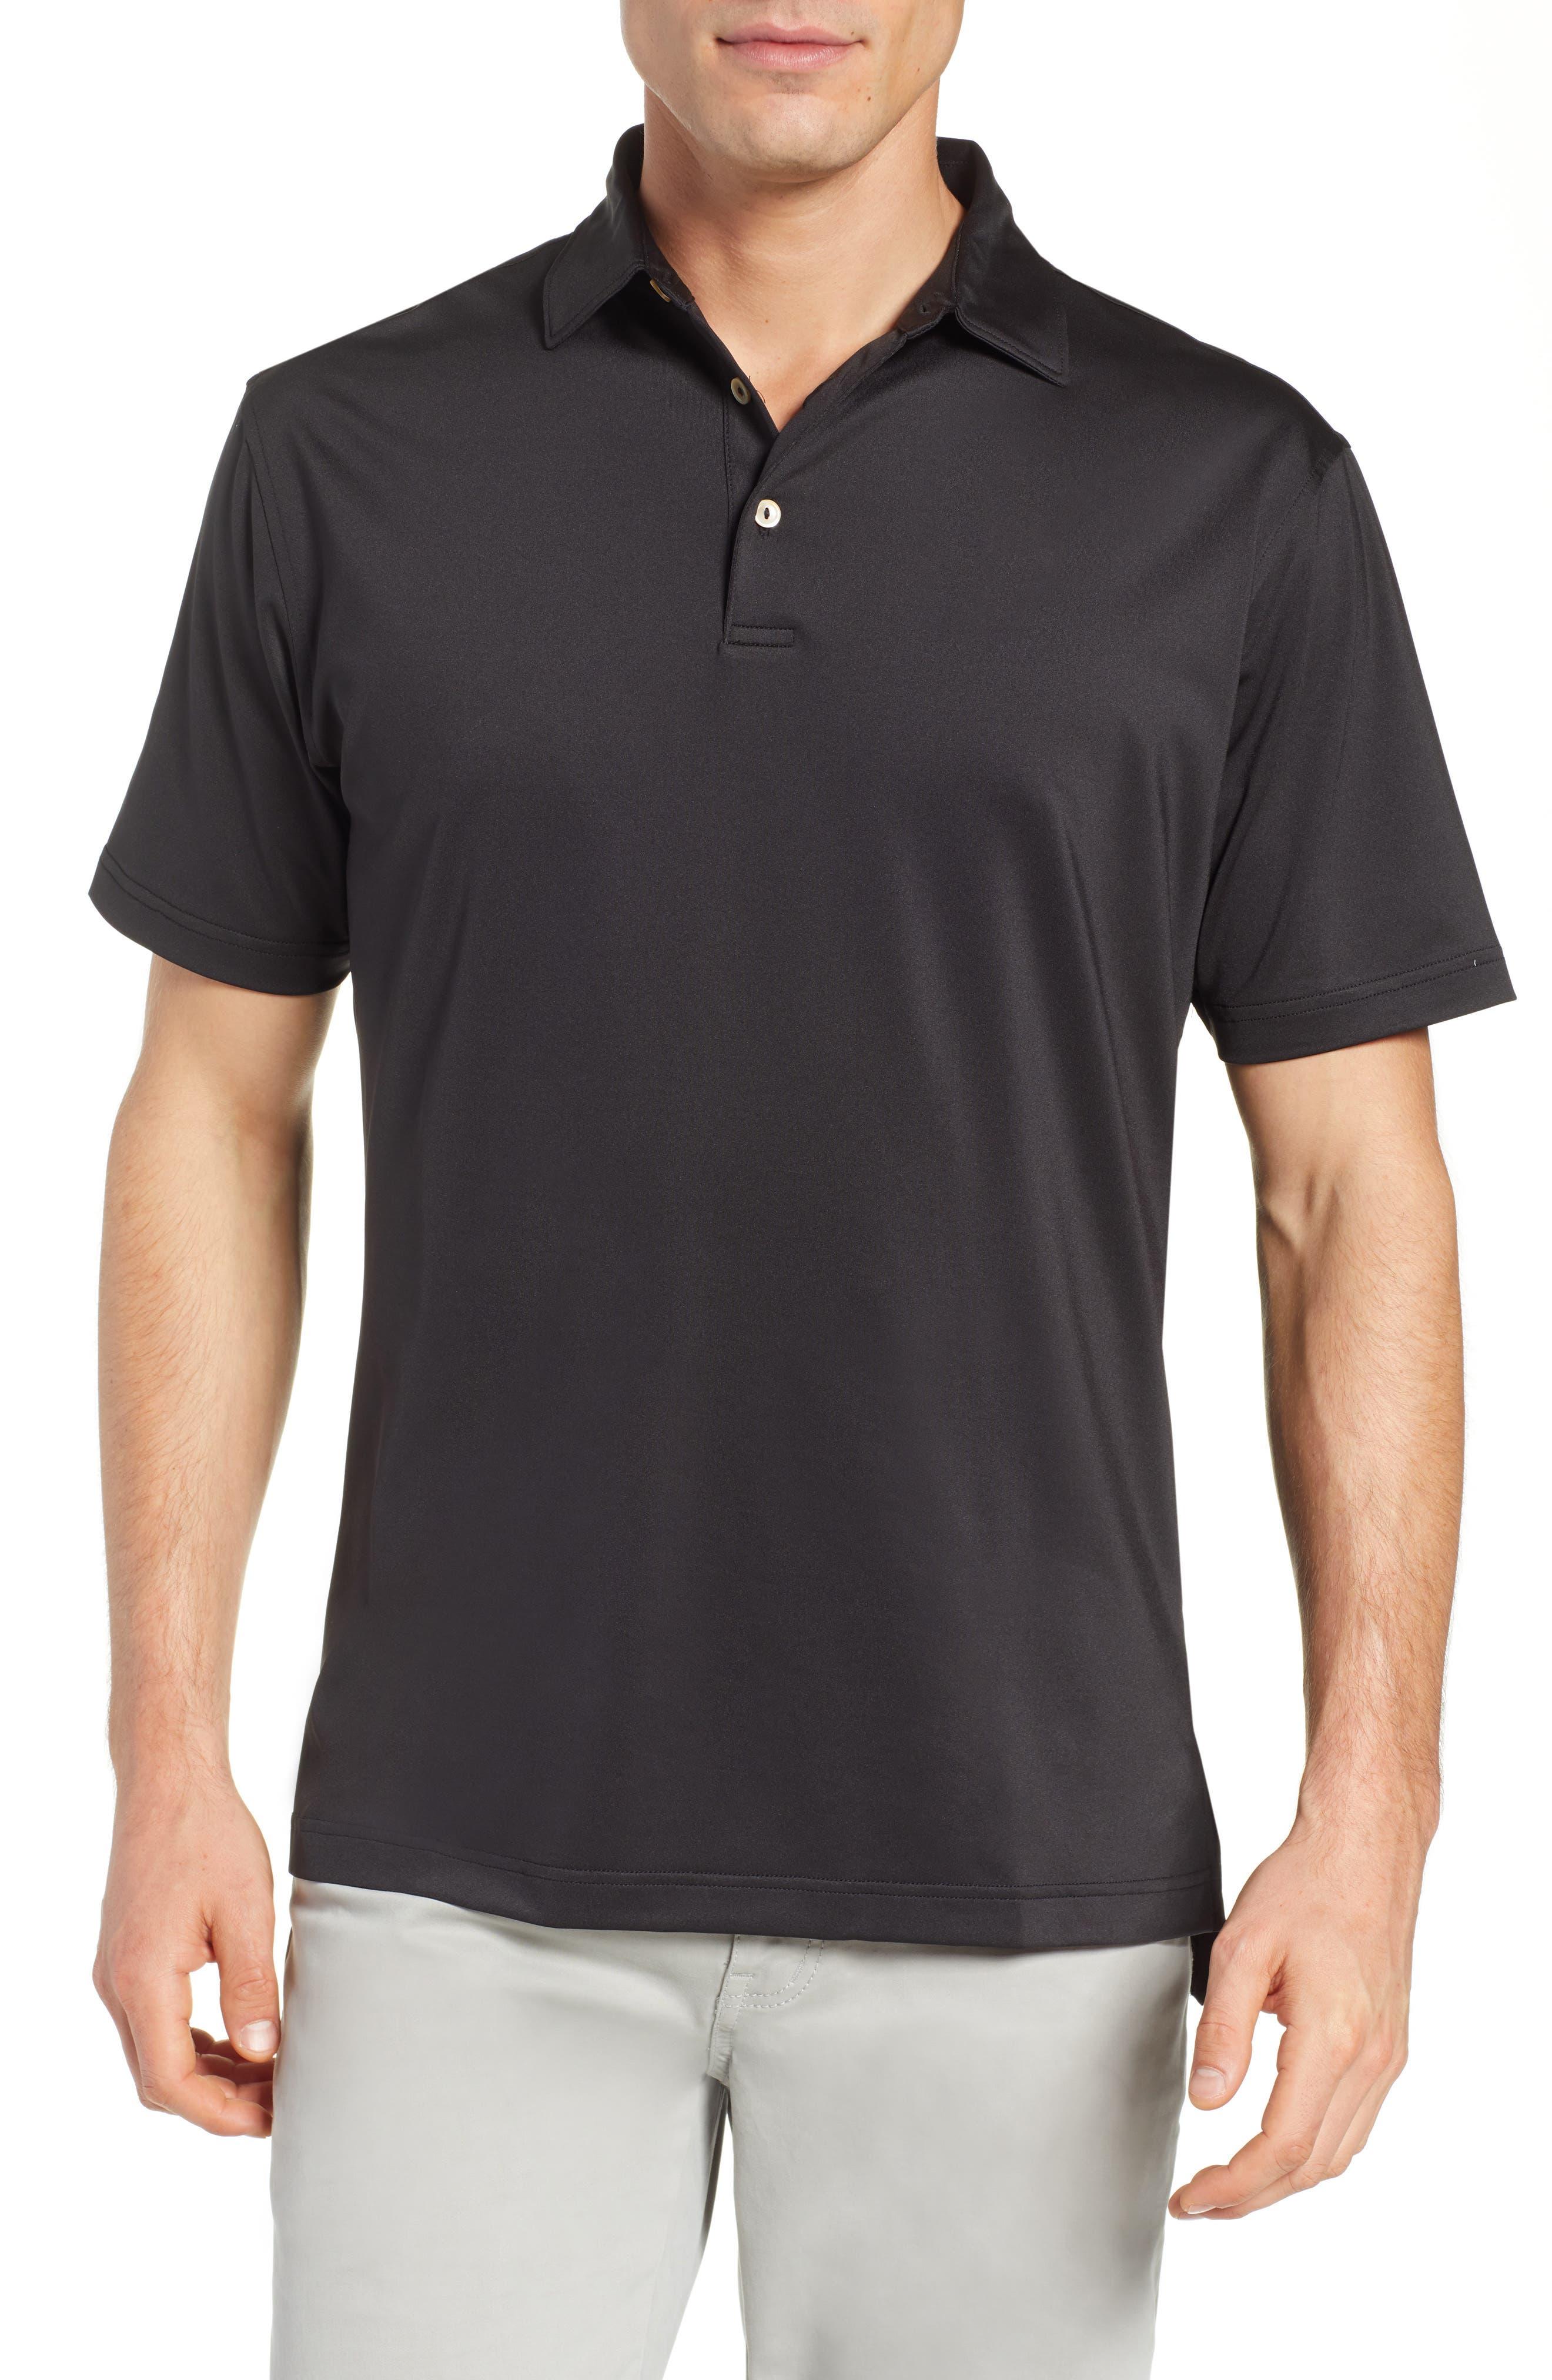 PETER MILLAR, Sean Regular Fit Stretch Jersey Polo, Main thumbnail 1, color, BLACK